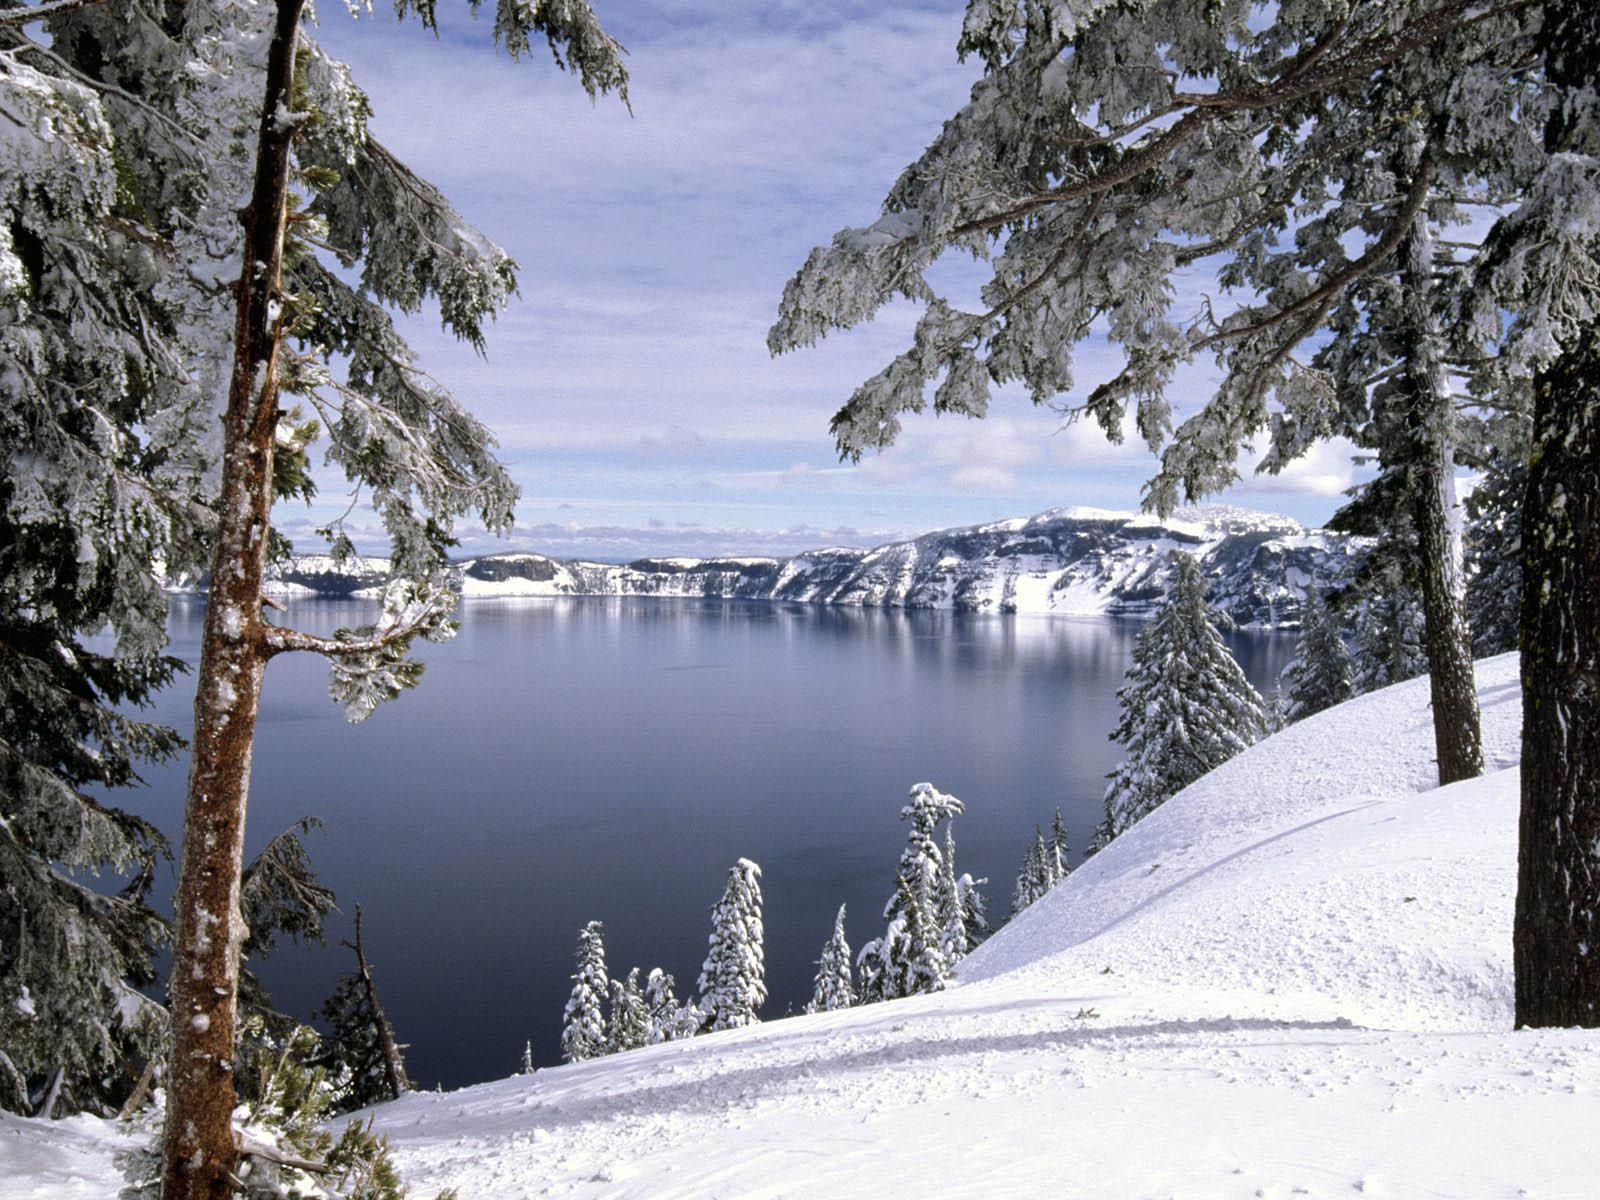 winter computer wallpaper,snow,winter,nature,tree,wilderness